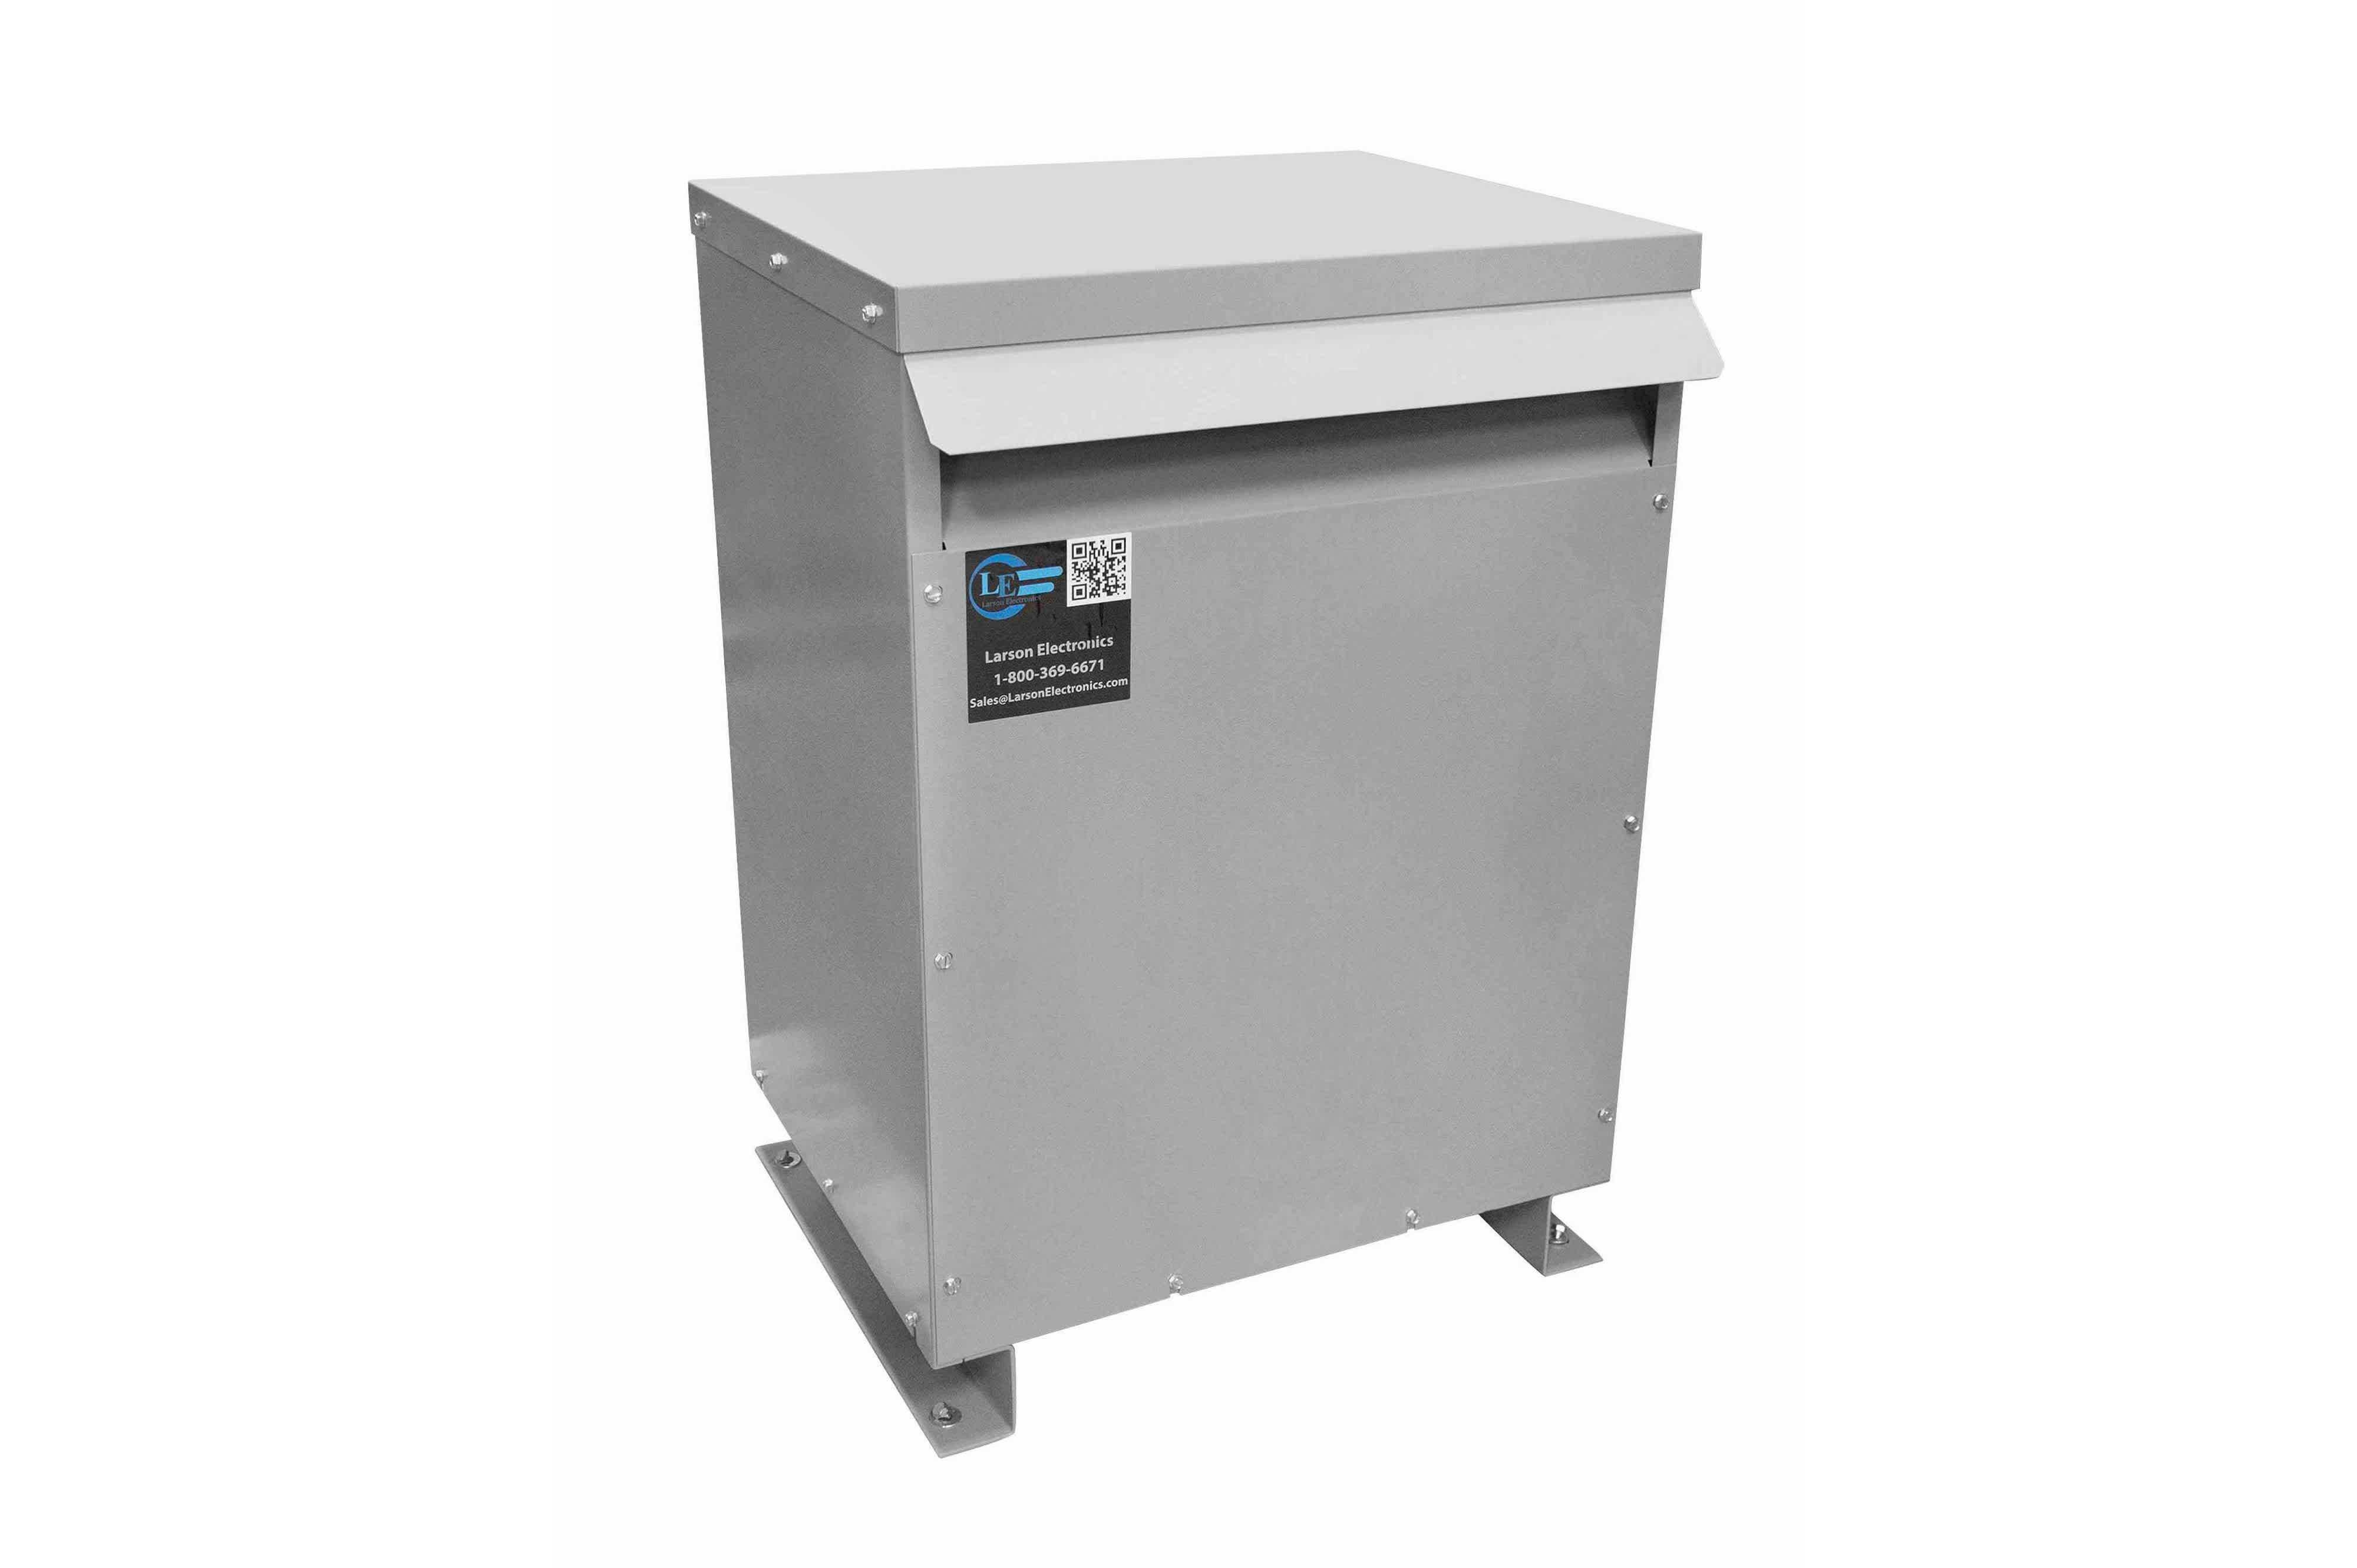 37.5 kVA 3PH DOE Transformer, 460V Delta Primary, 575Y/332 Wye-N Secondary, N3R, Ventilated, 60 Hz